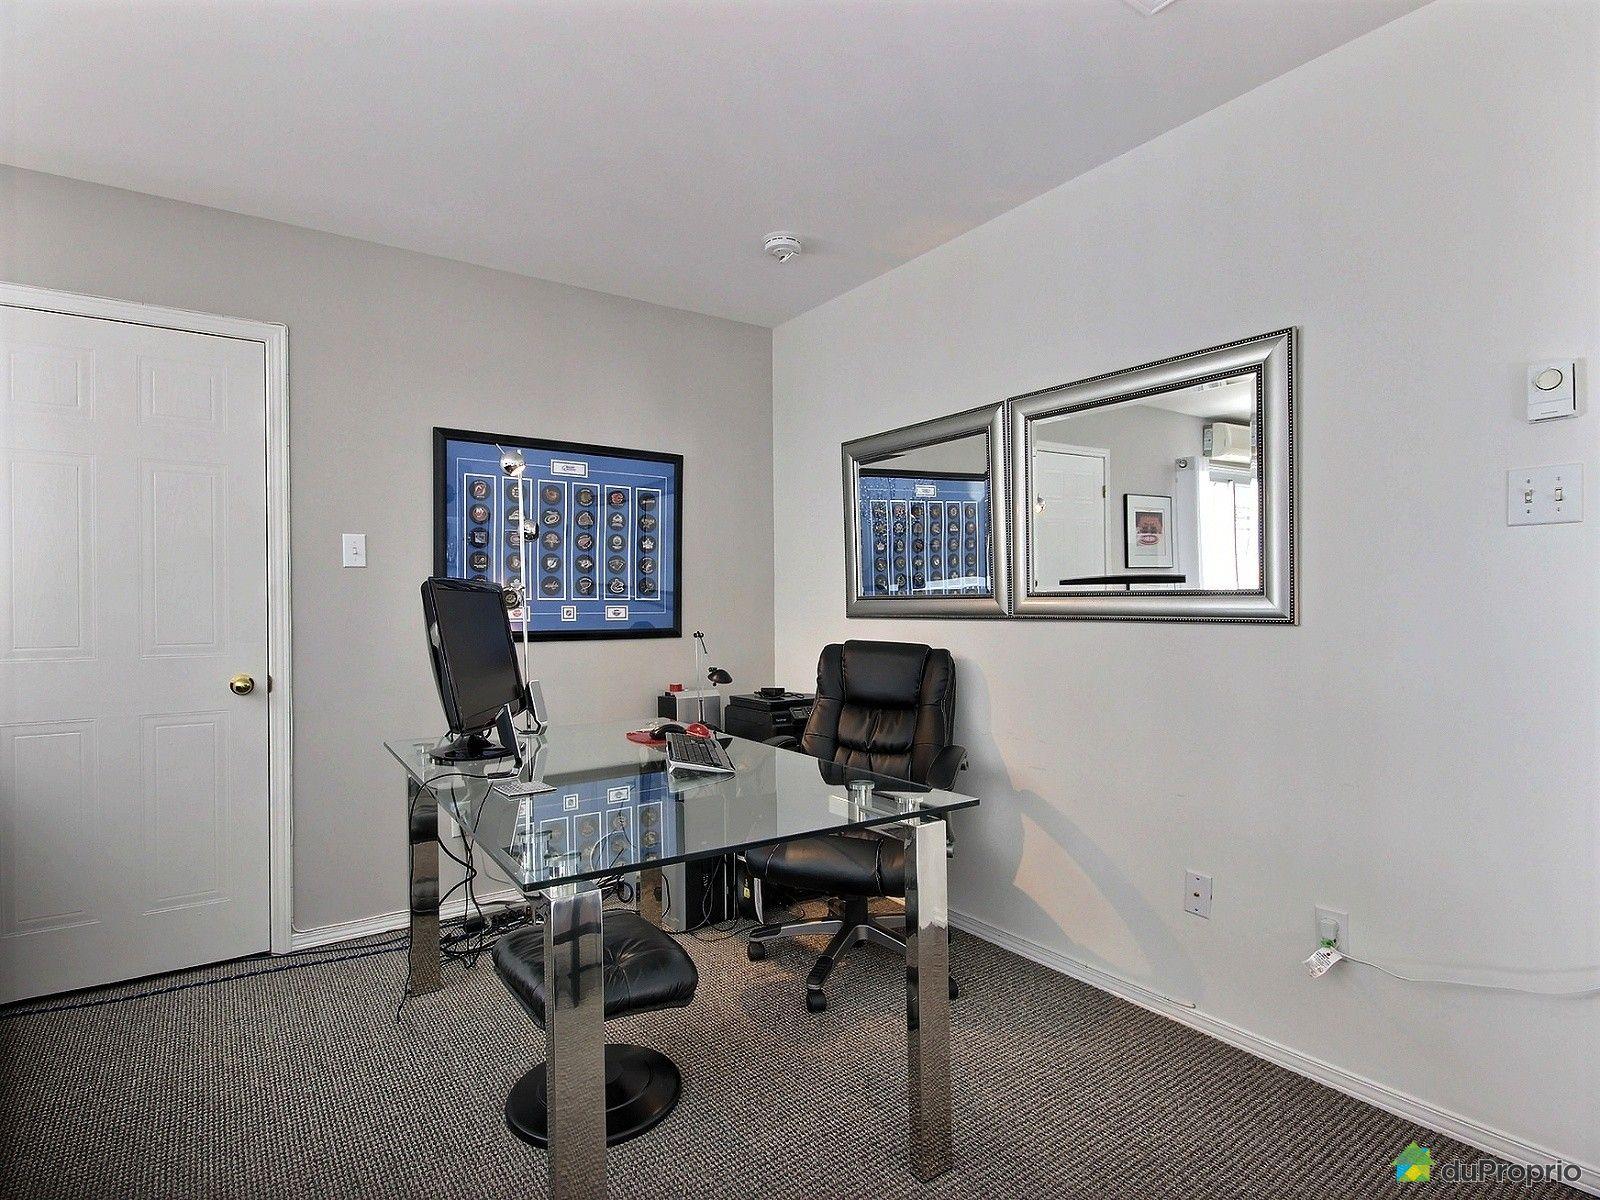 condo vendu mont st hilaire immobilier qu bec duproprio 475426. Black Bedroom Furniture Sets. Home Design Ideas